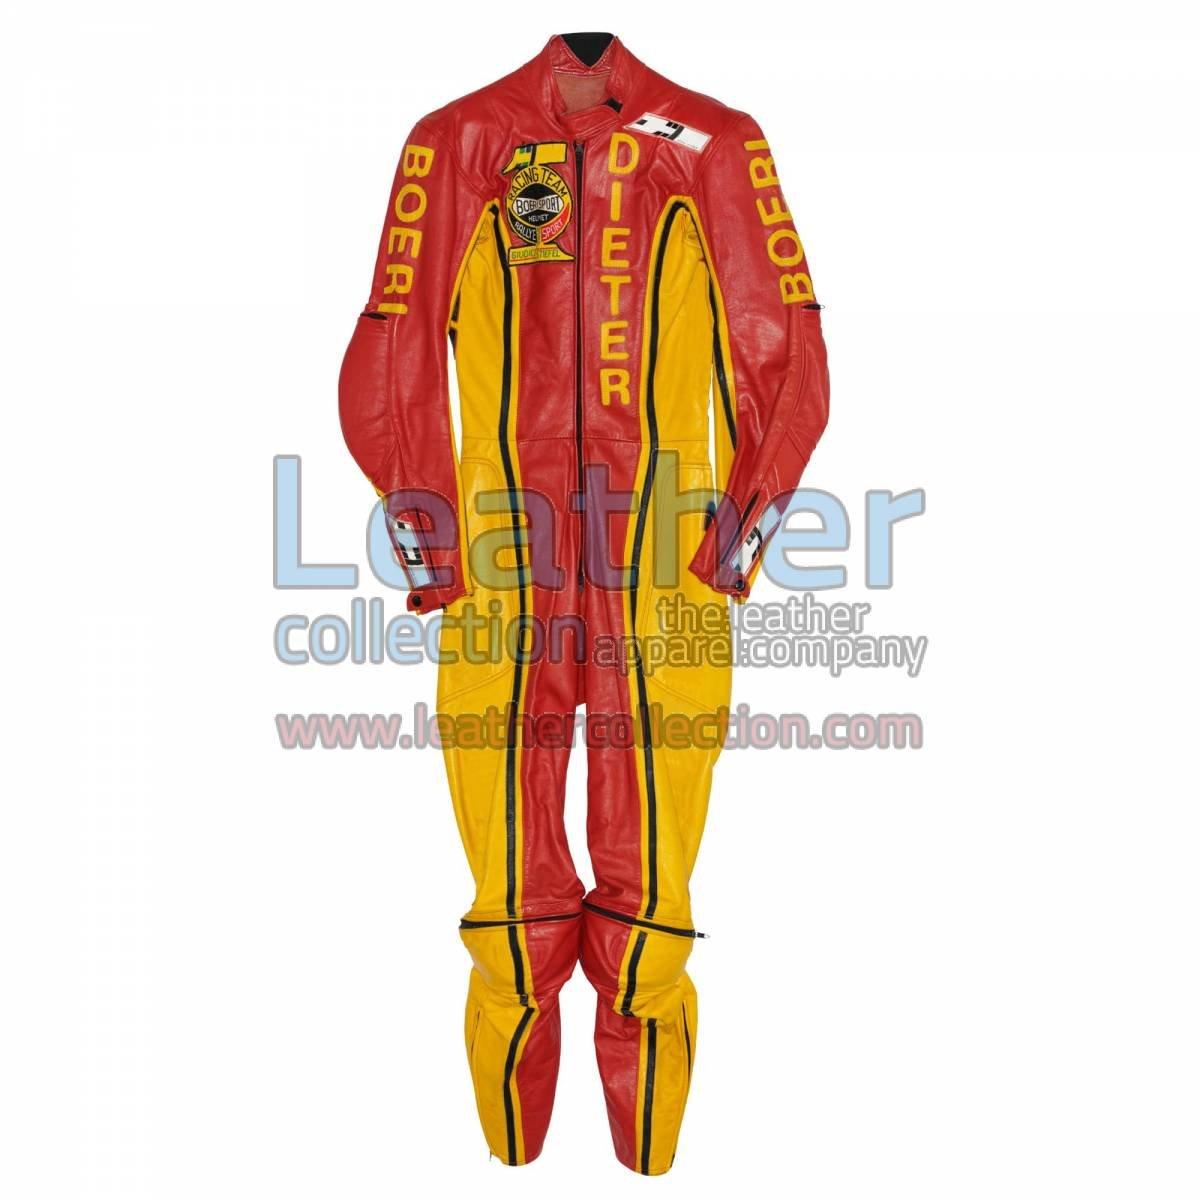 Dieter Braun Yamaha GP 1973 Leather Suit